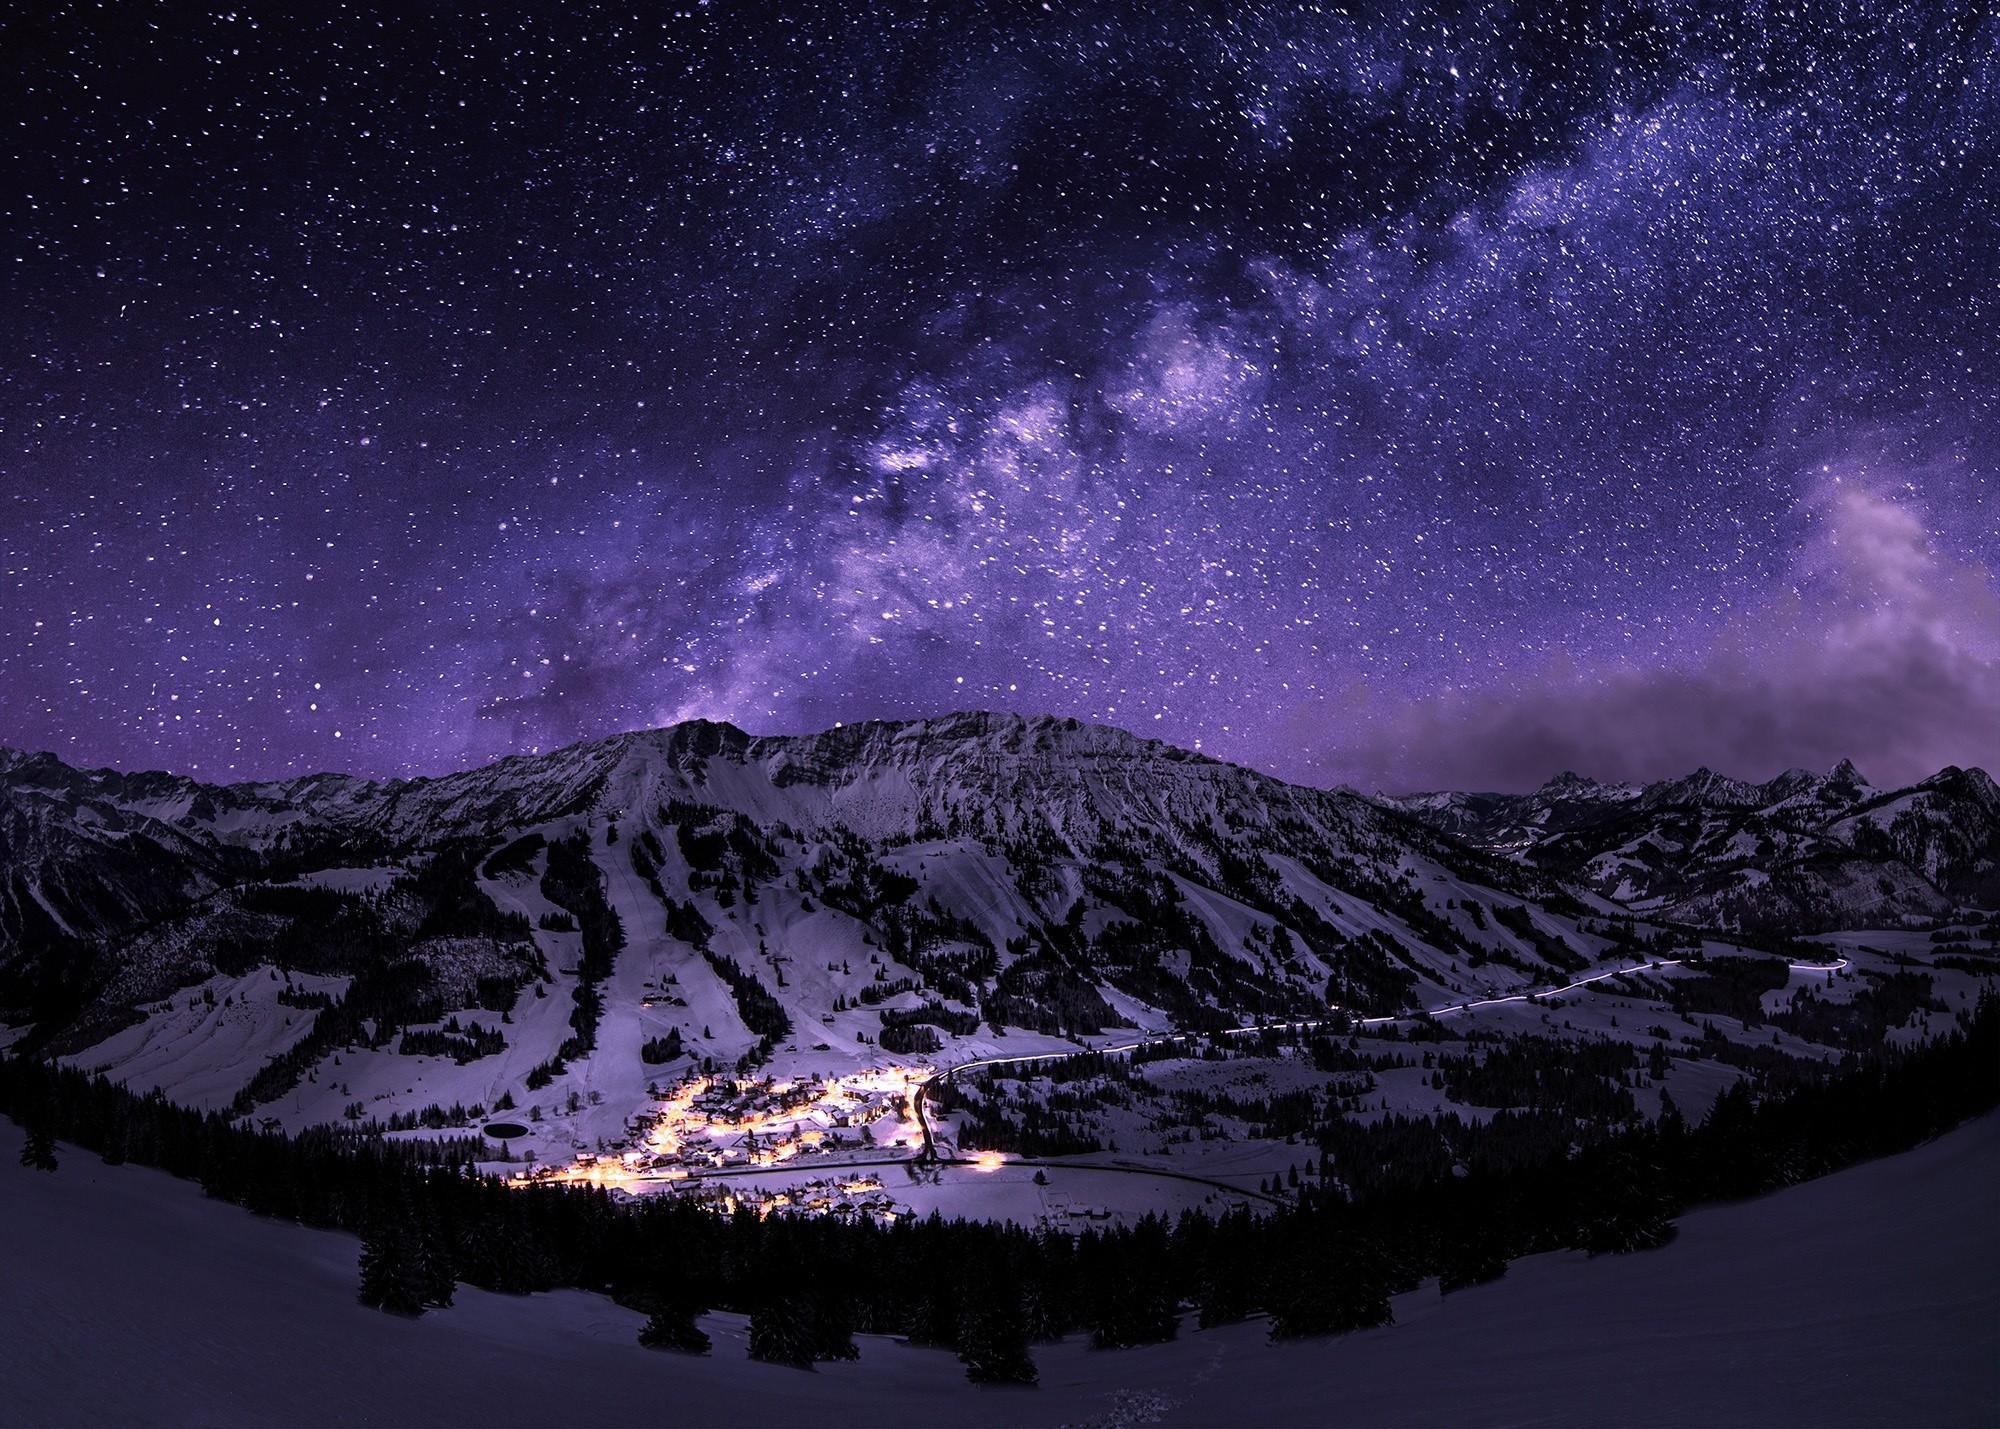 Simple Wallpaper Night Landscape - 2000x1429-px-galaxy-landscape-long-exposure-mountain-night-snow-starry-night-stars-town-1104900  Gallery-825484.jpg